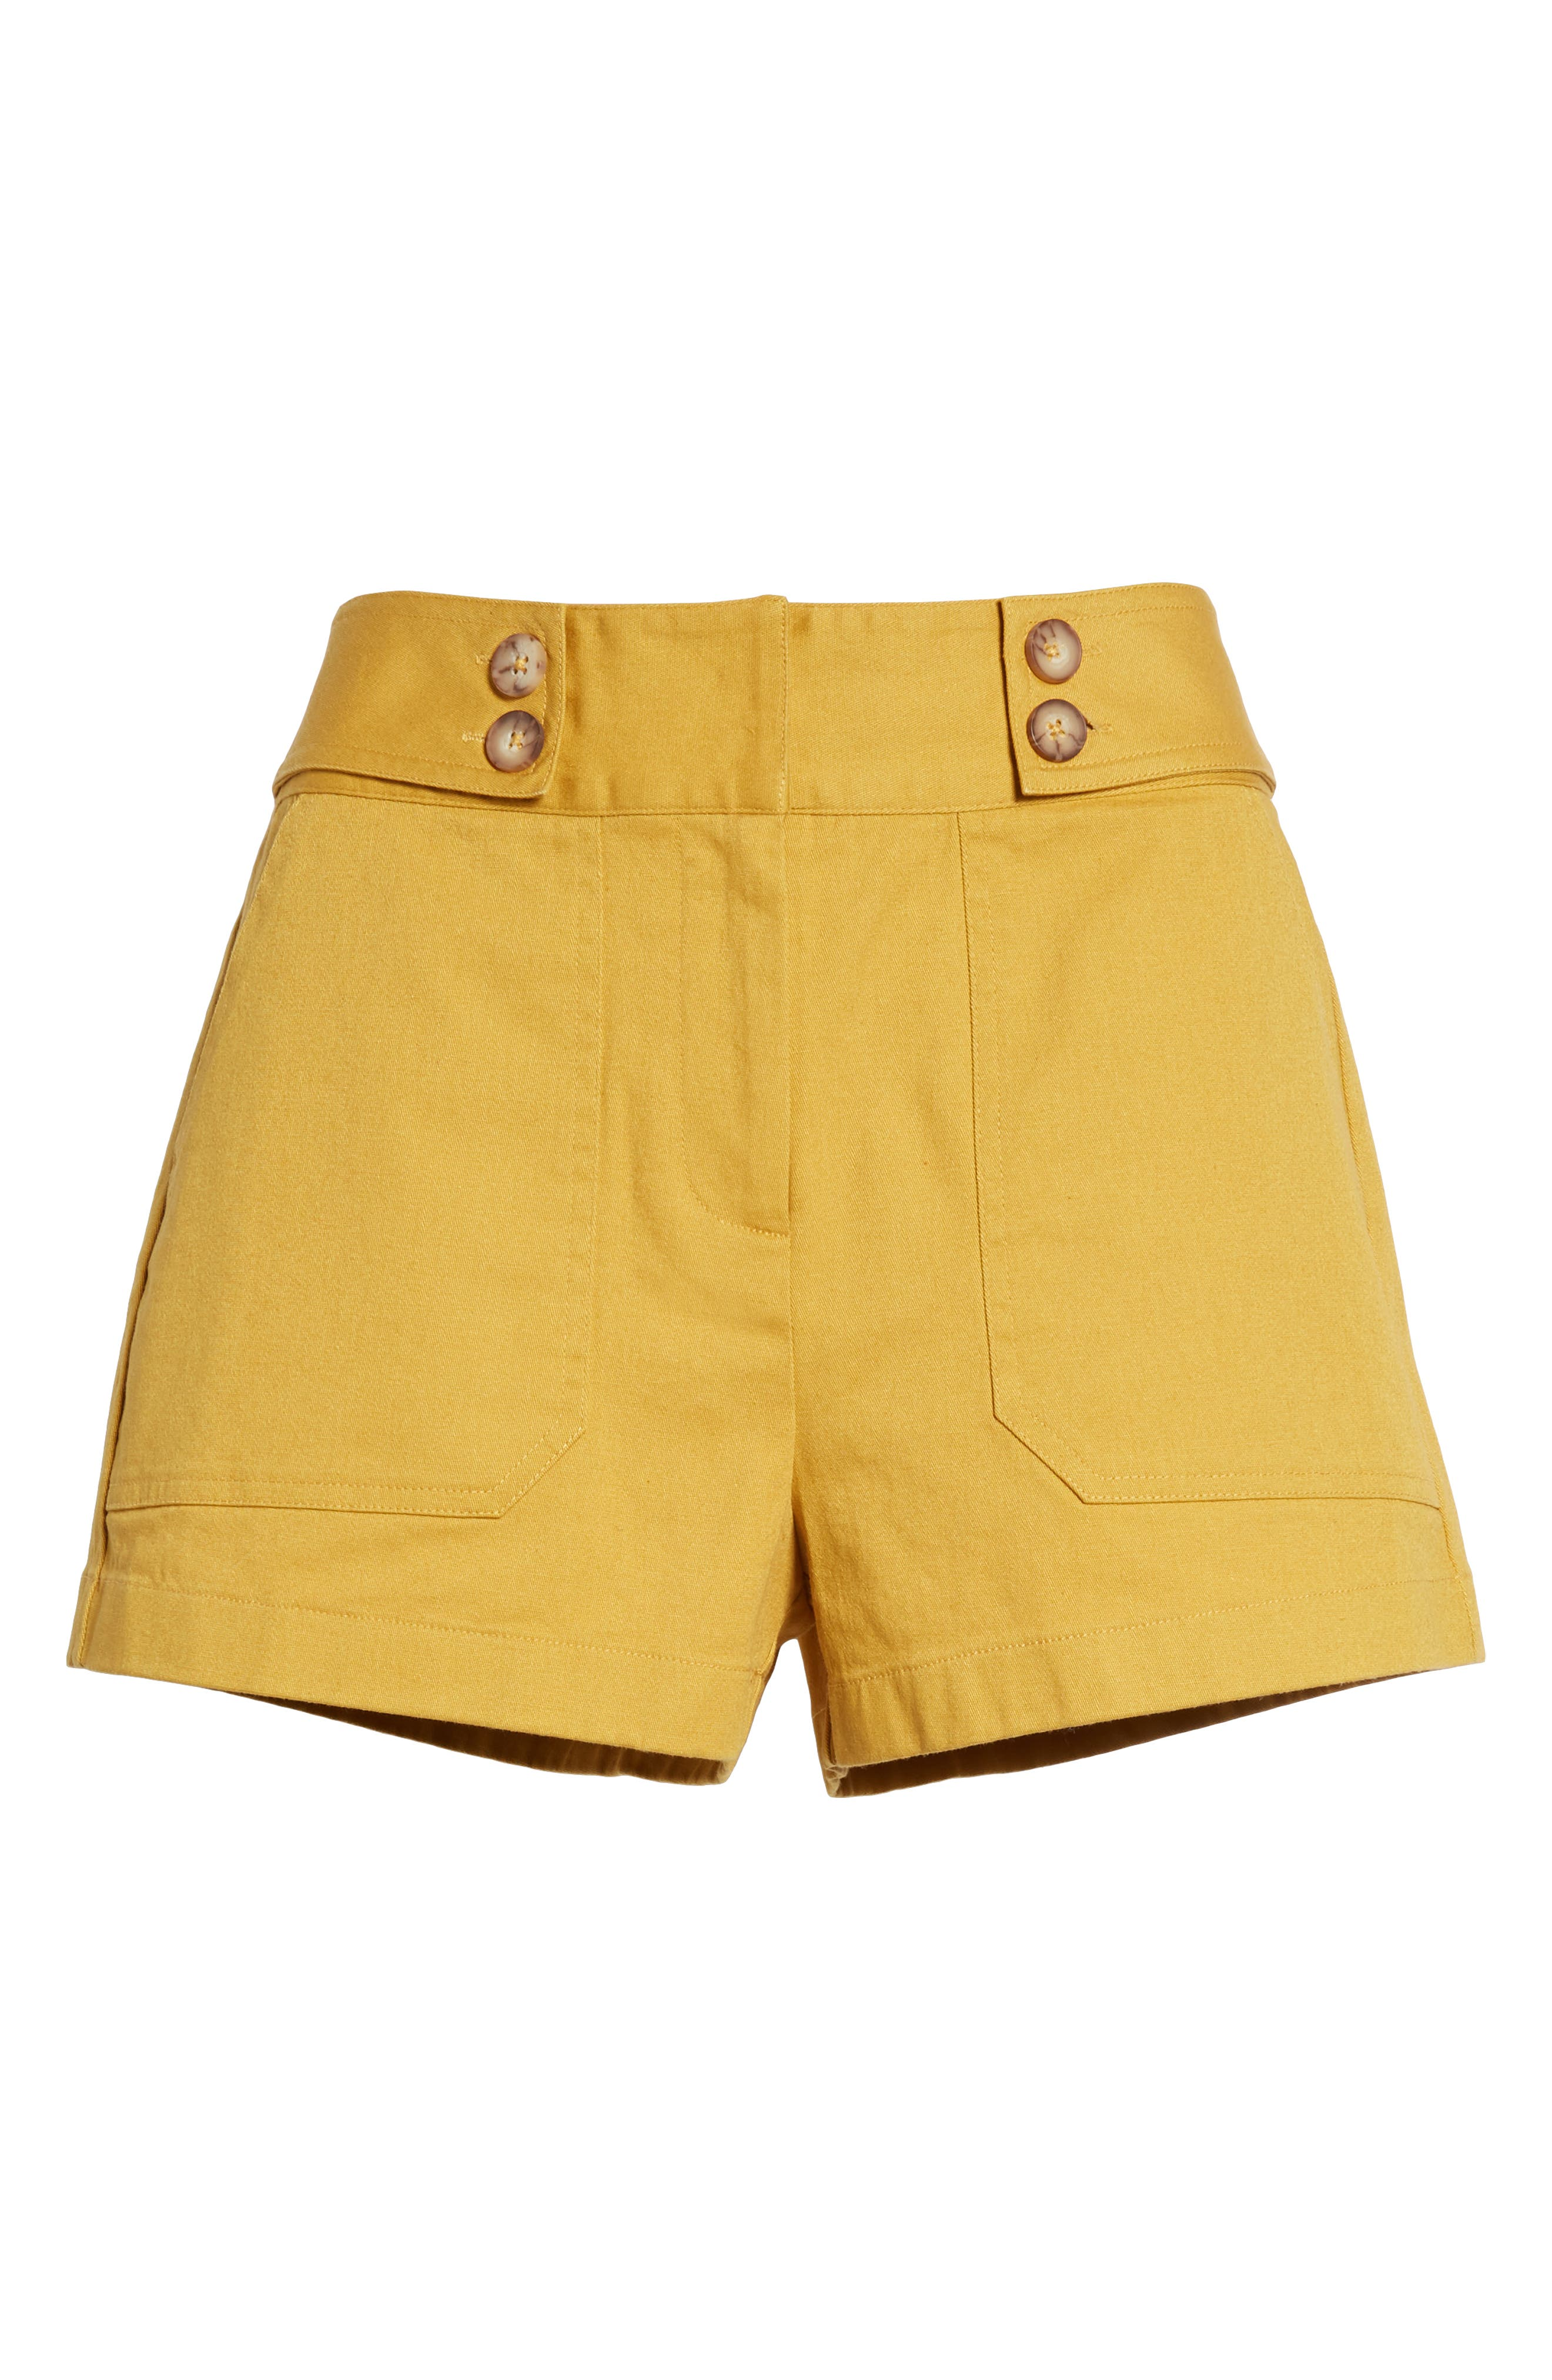 High Waist Sailor Shorts,                             Alternate thumbnail 6, color,                             MUSTARD